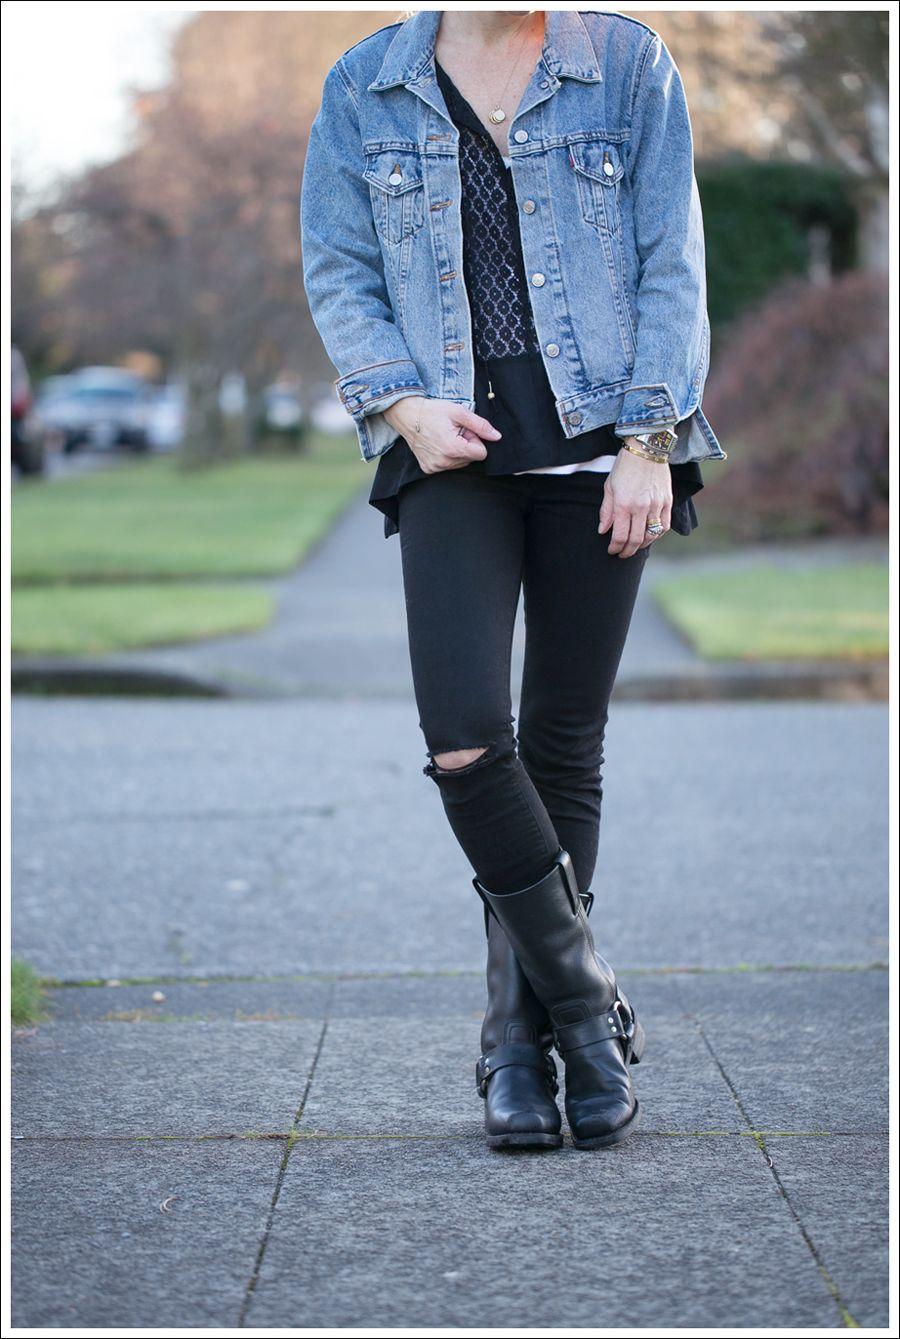 7d4146be530 Vintage Levis Jean Jacket + Ripped Black J Brand Skinny Jeans + Frye  Harness Boots